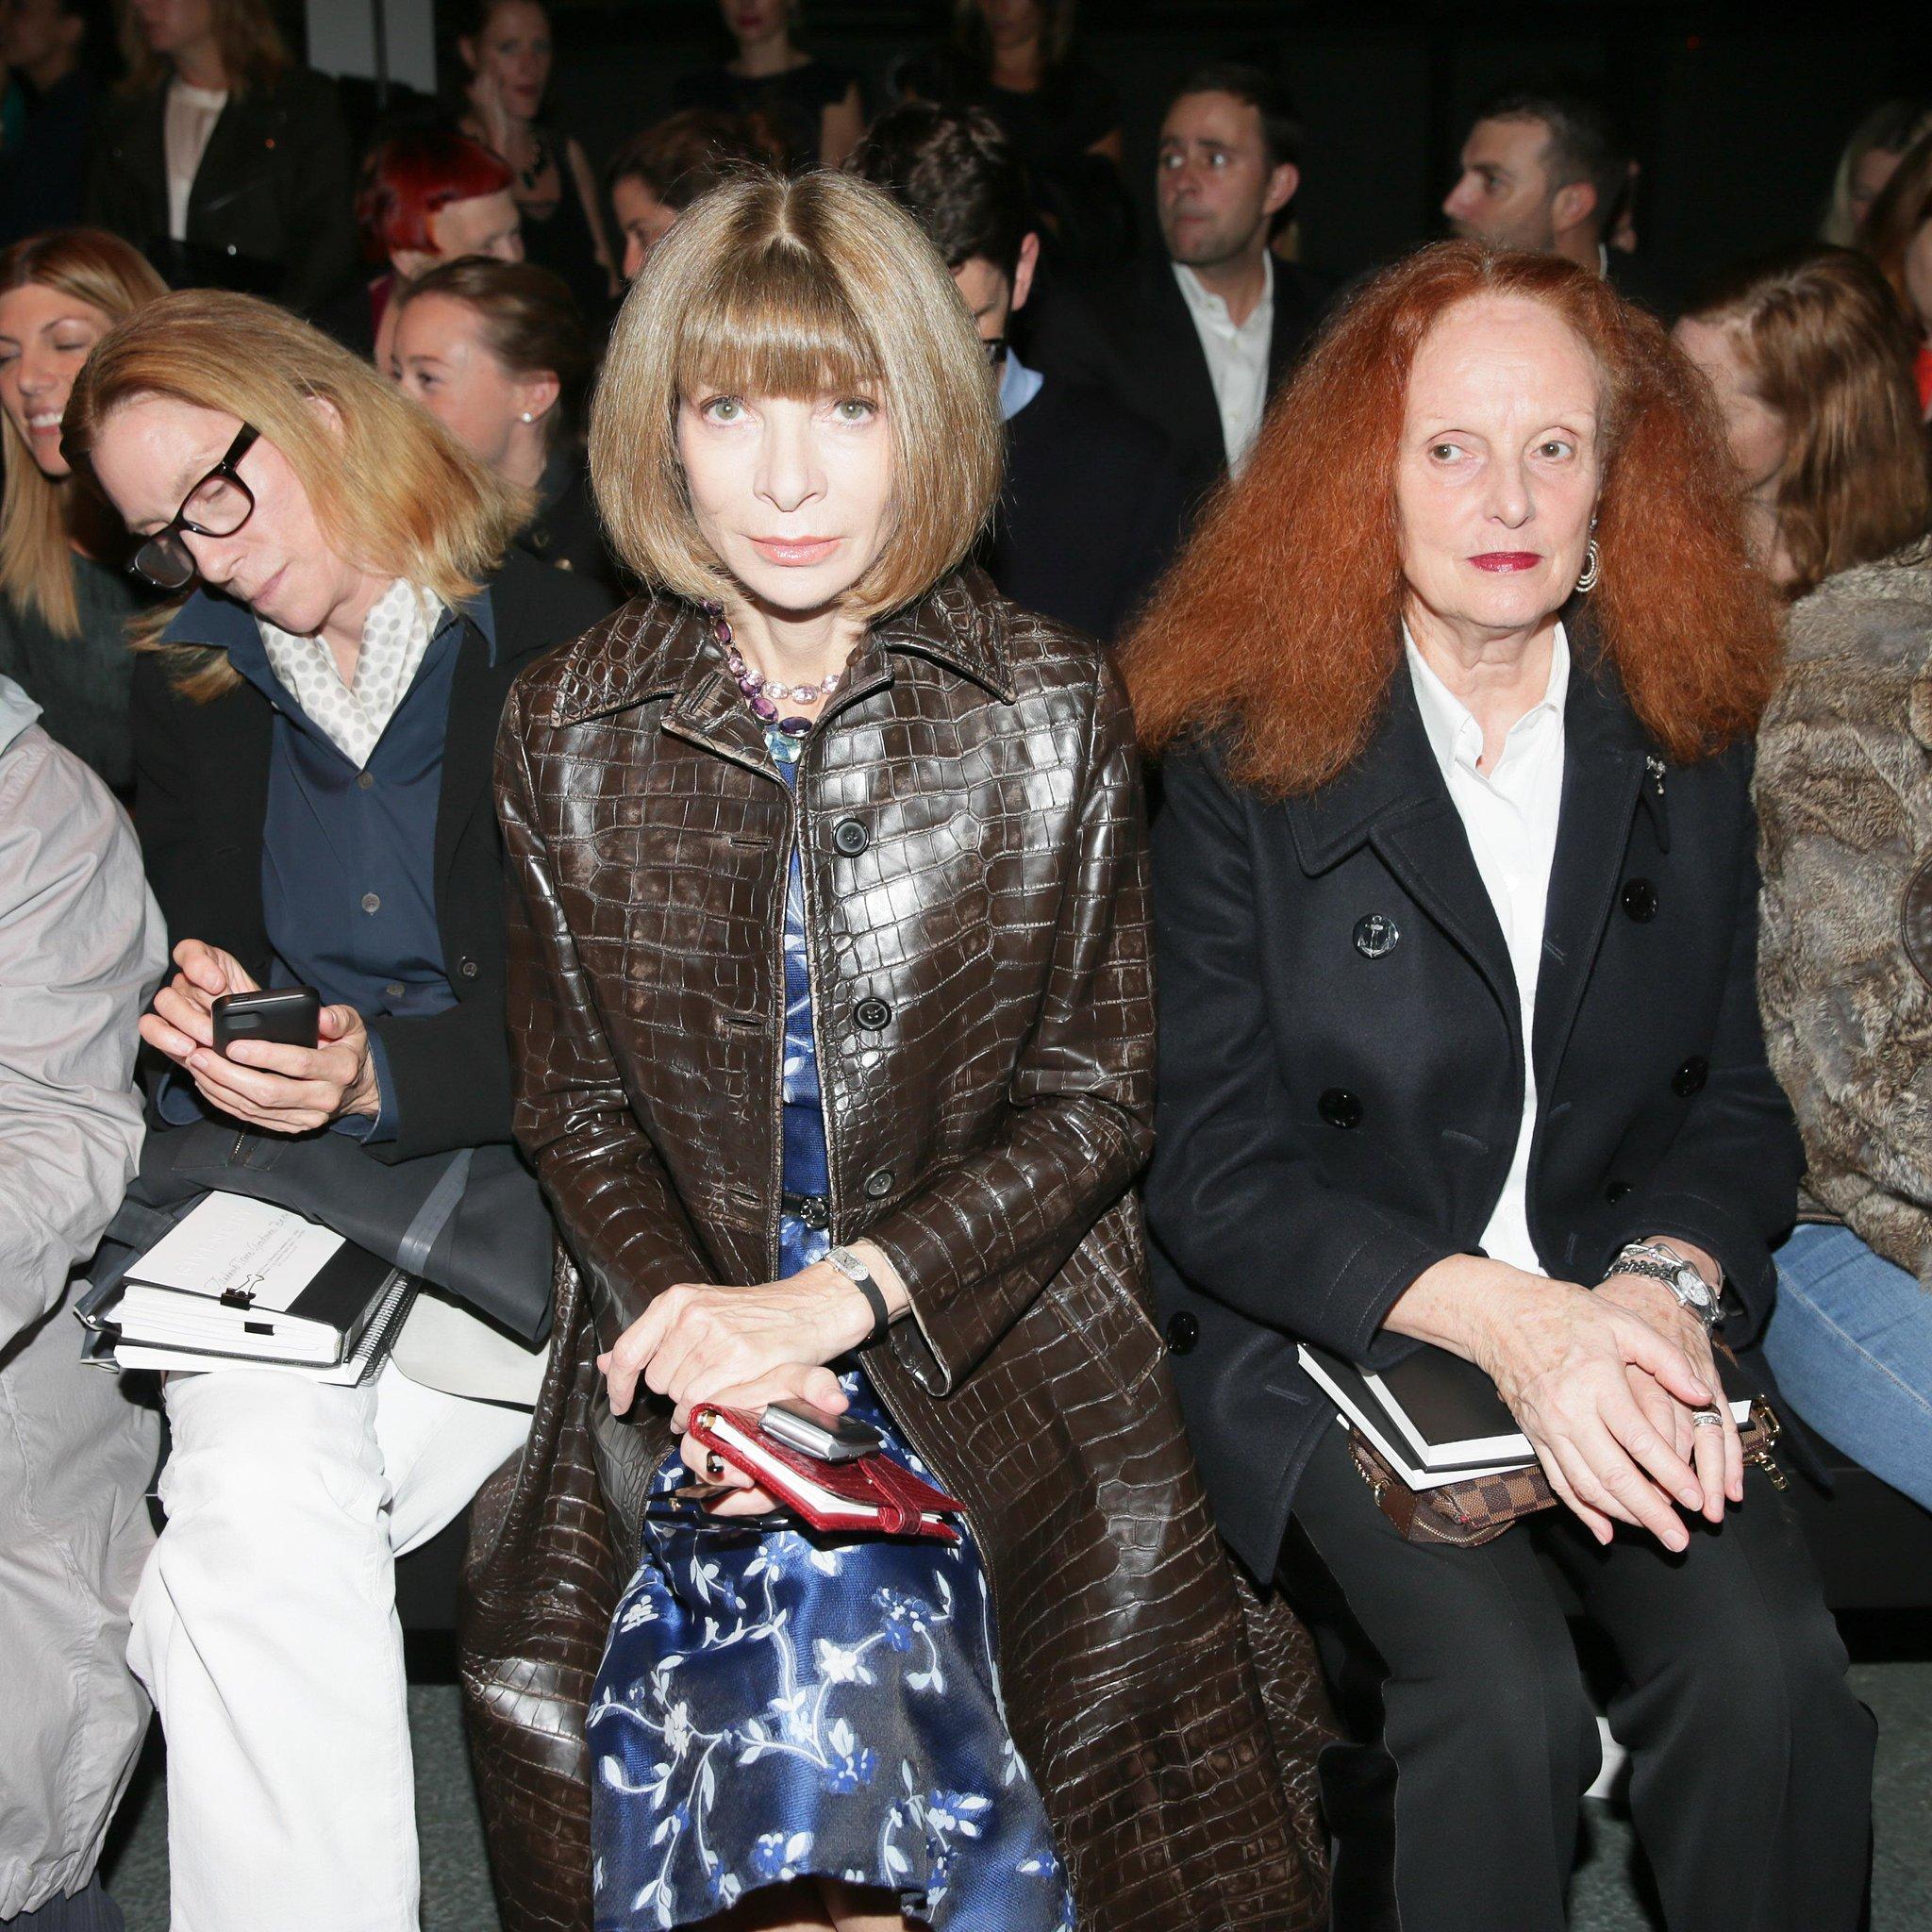 Anna Wintour joined Grace Coddington for Givenchy's Spring 2014 show.